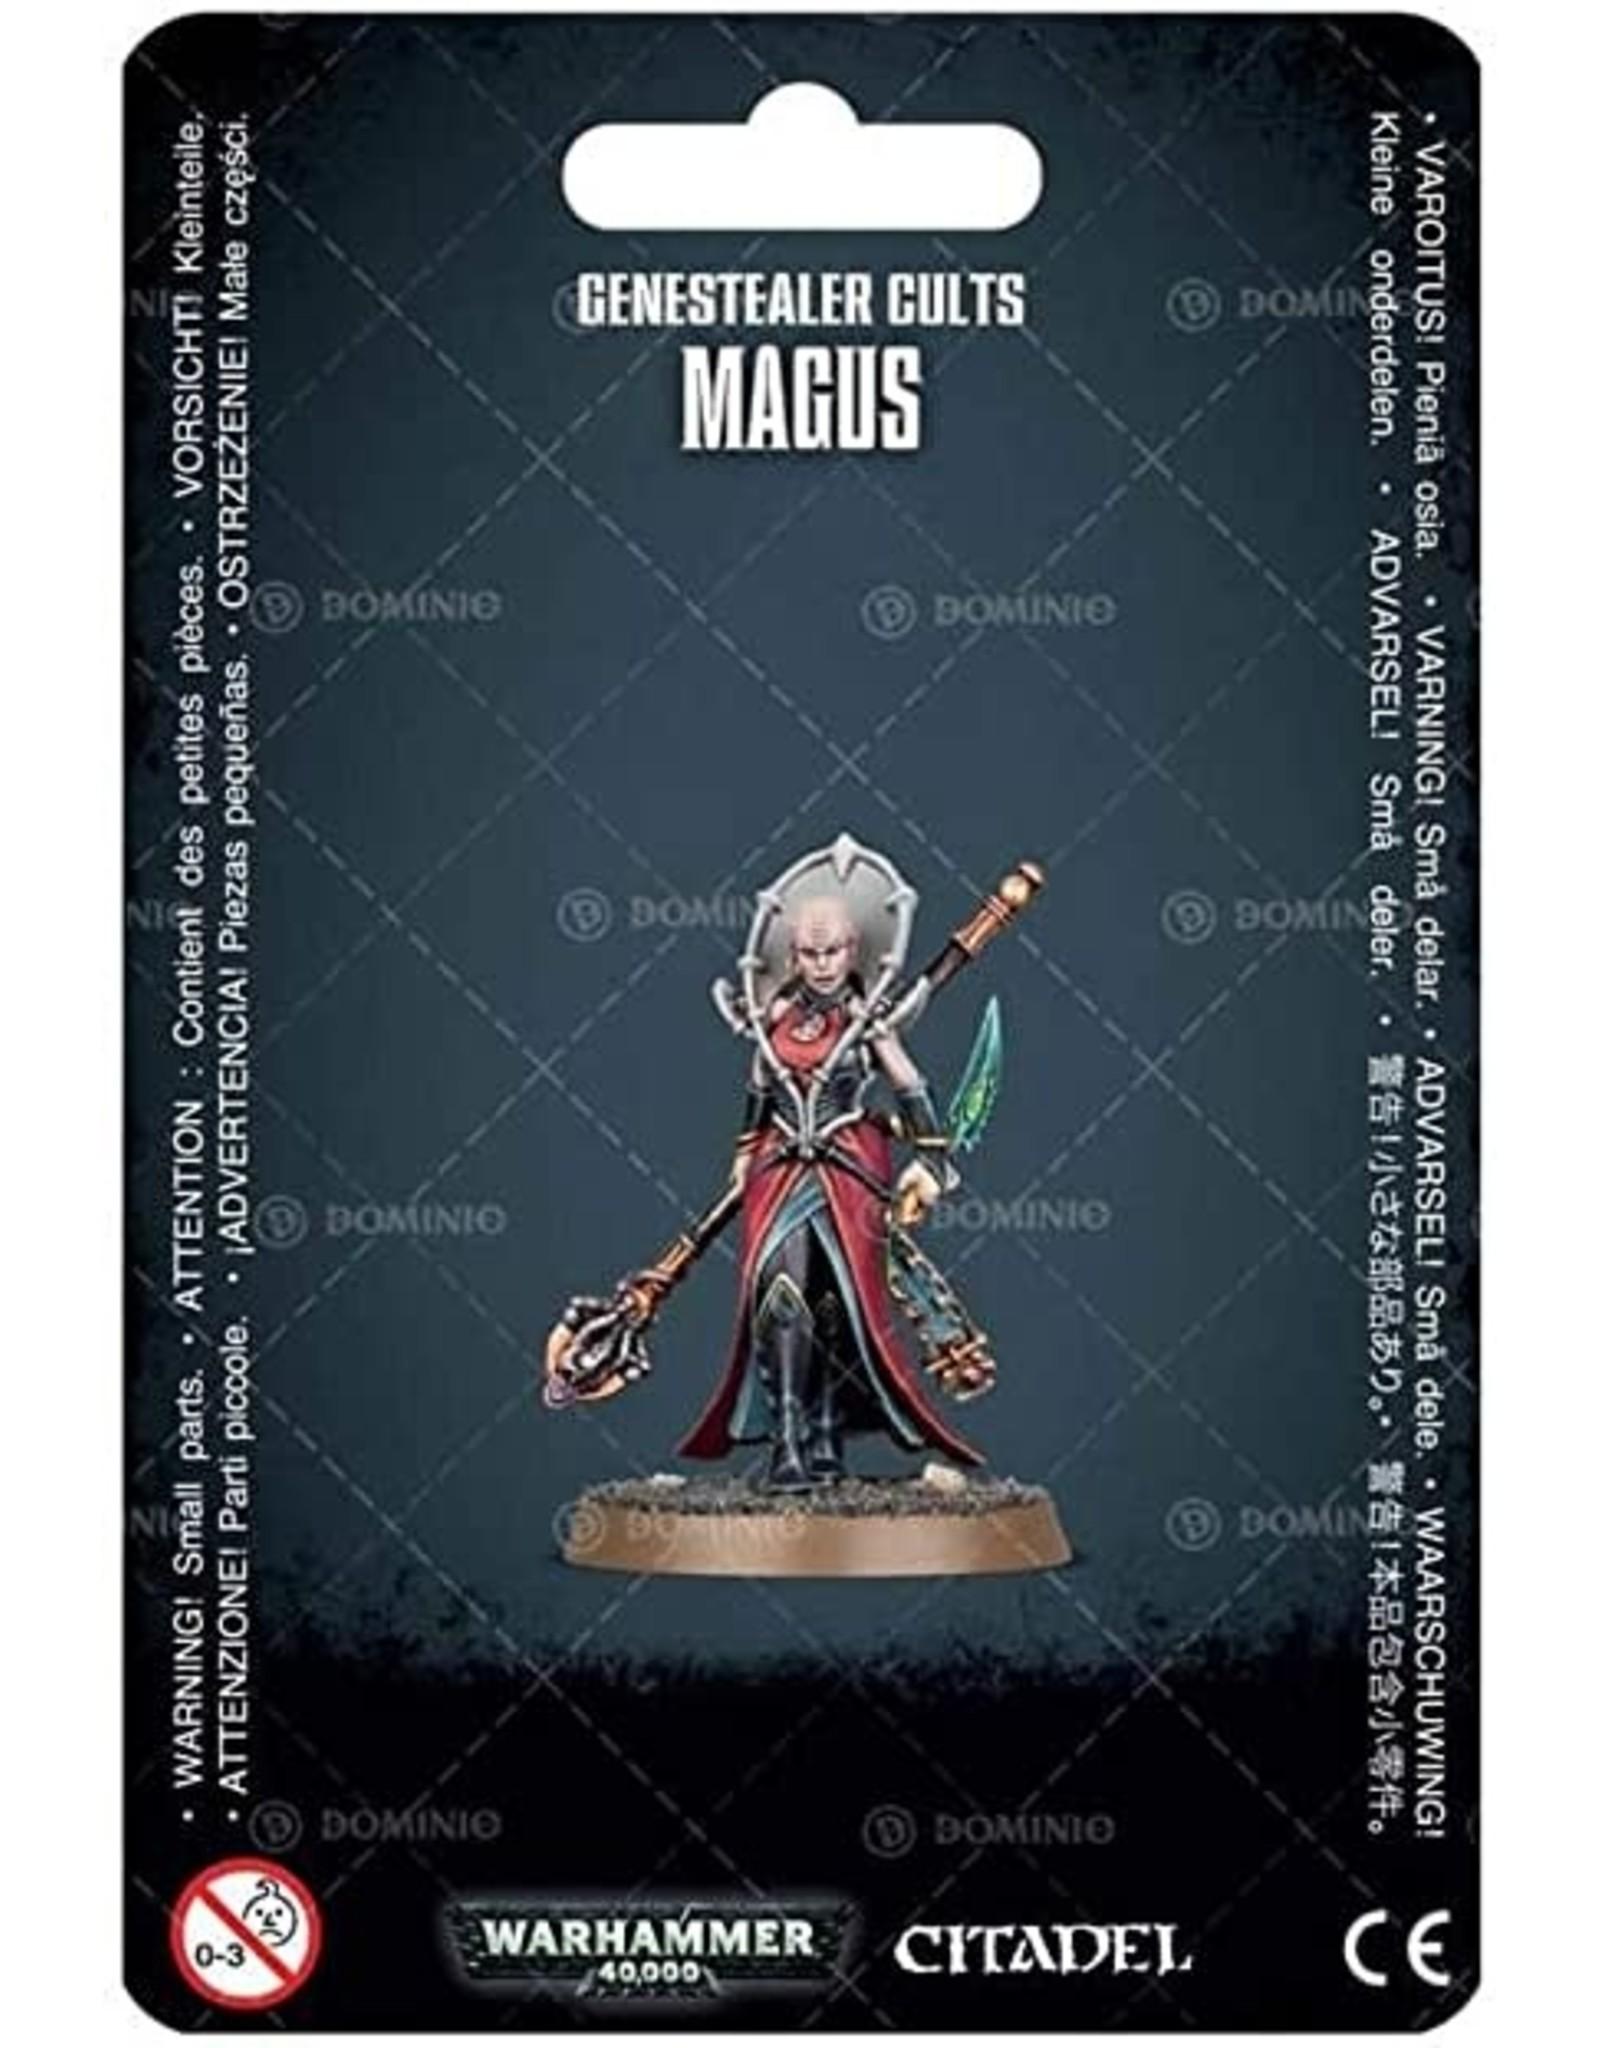 Genestealer Cults Magus (40K)